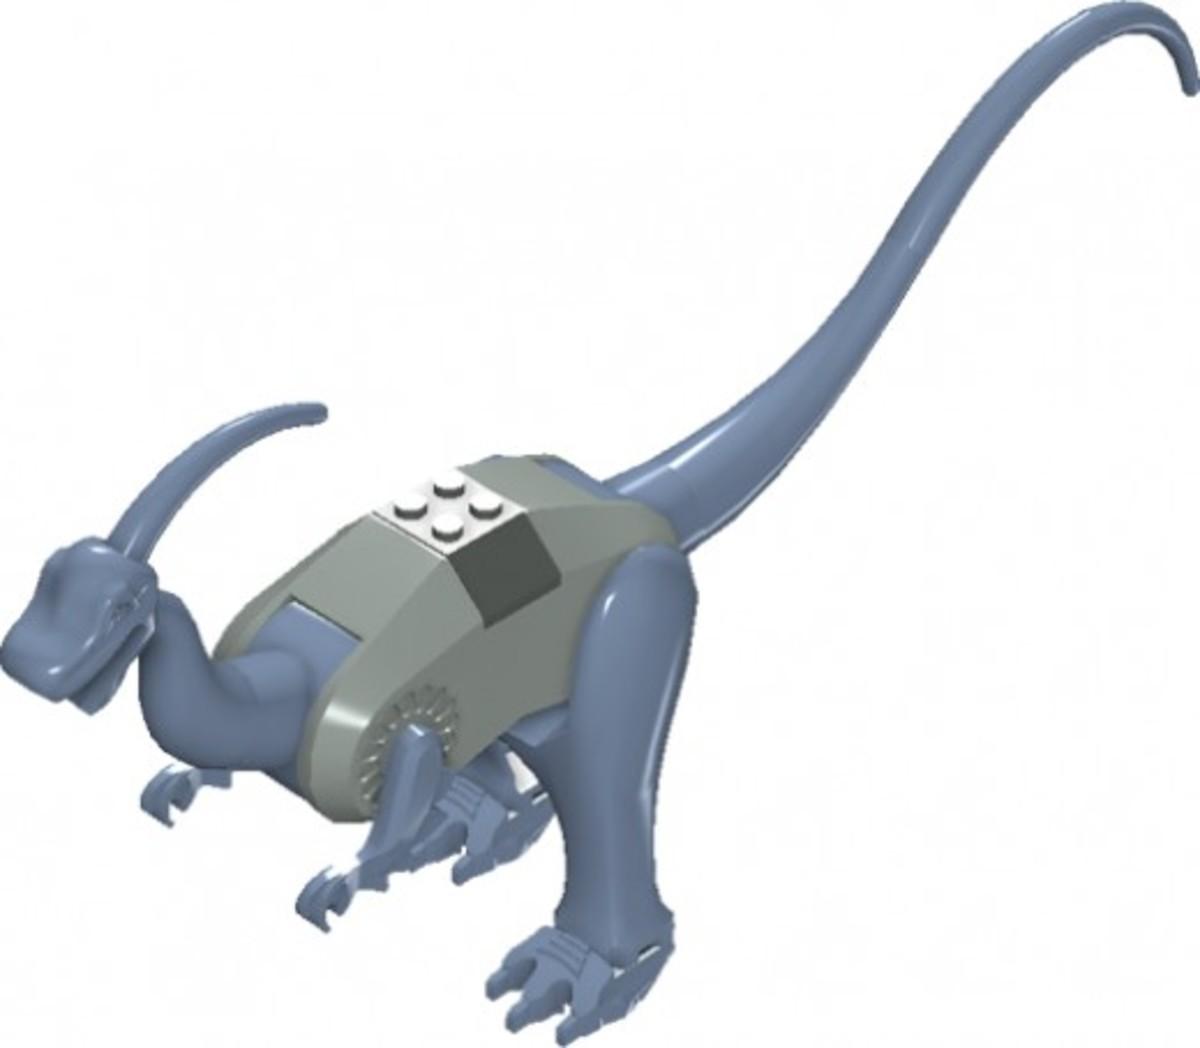 LEGO Dinosaurs Building Set List